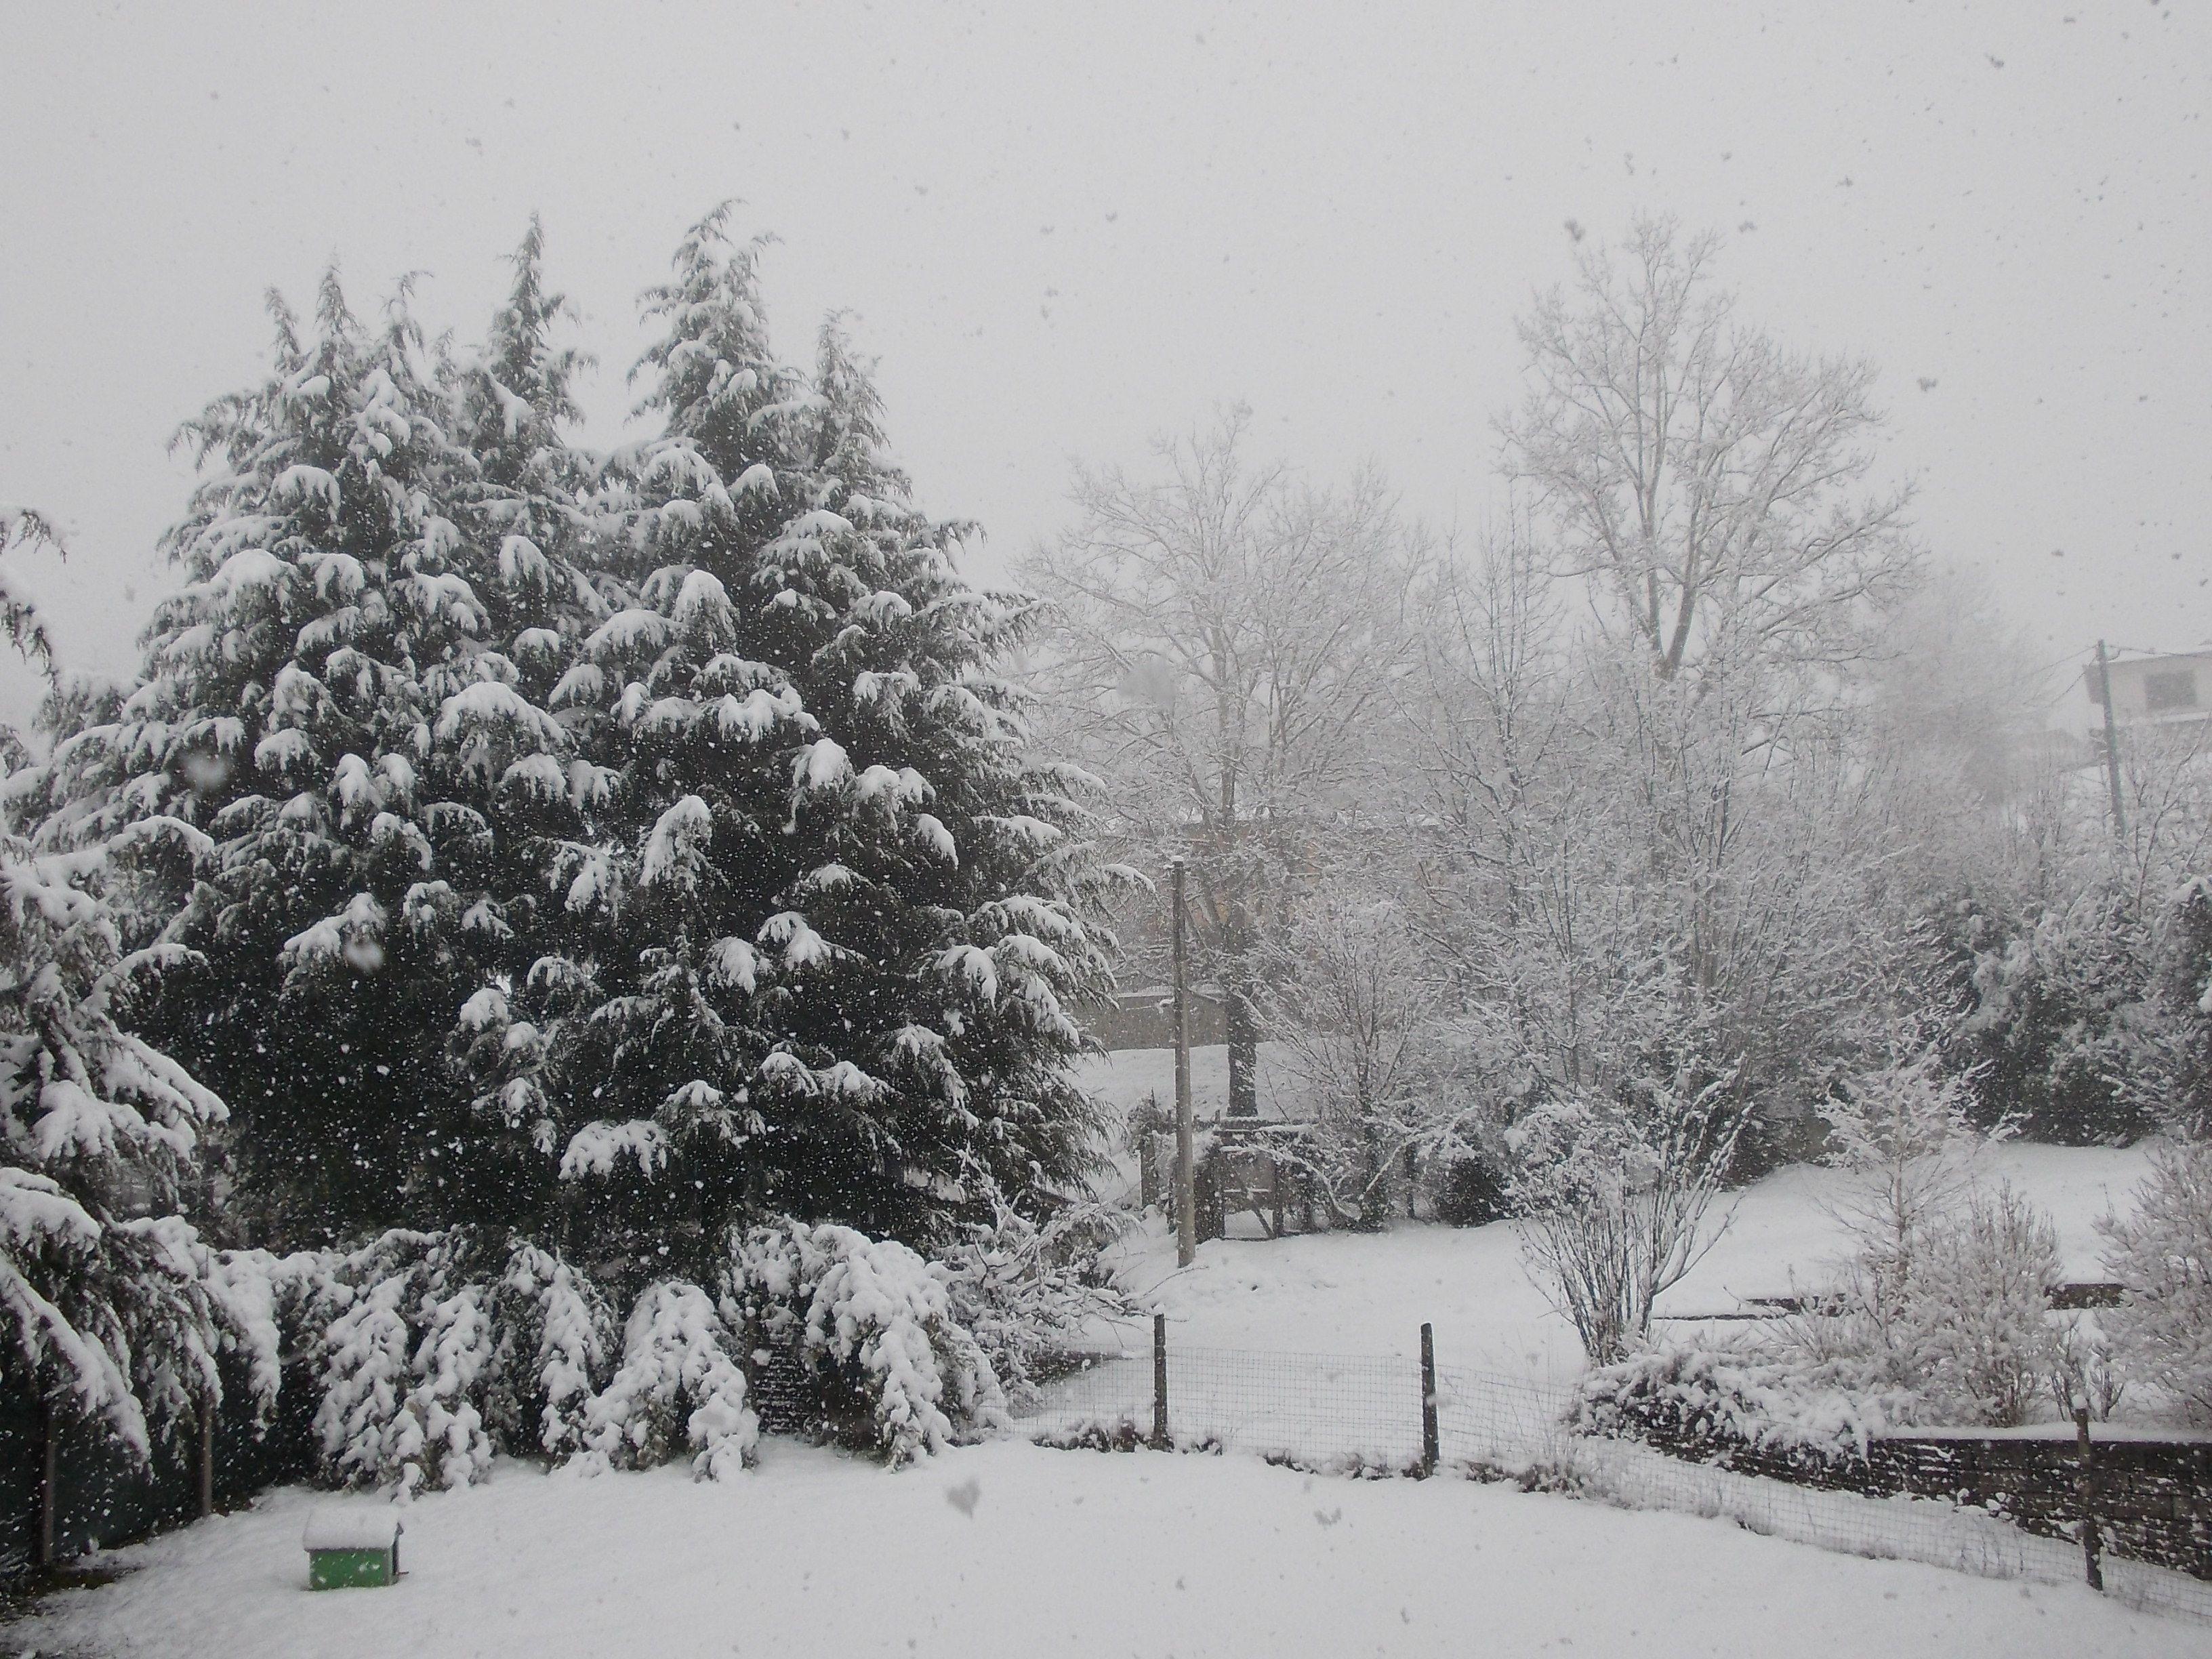 Al mio paese sta nevicando